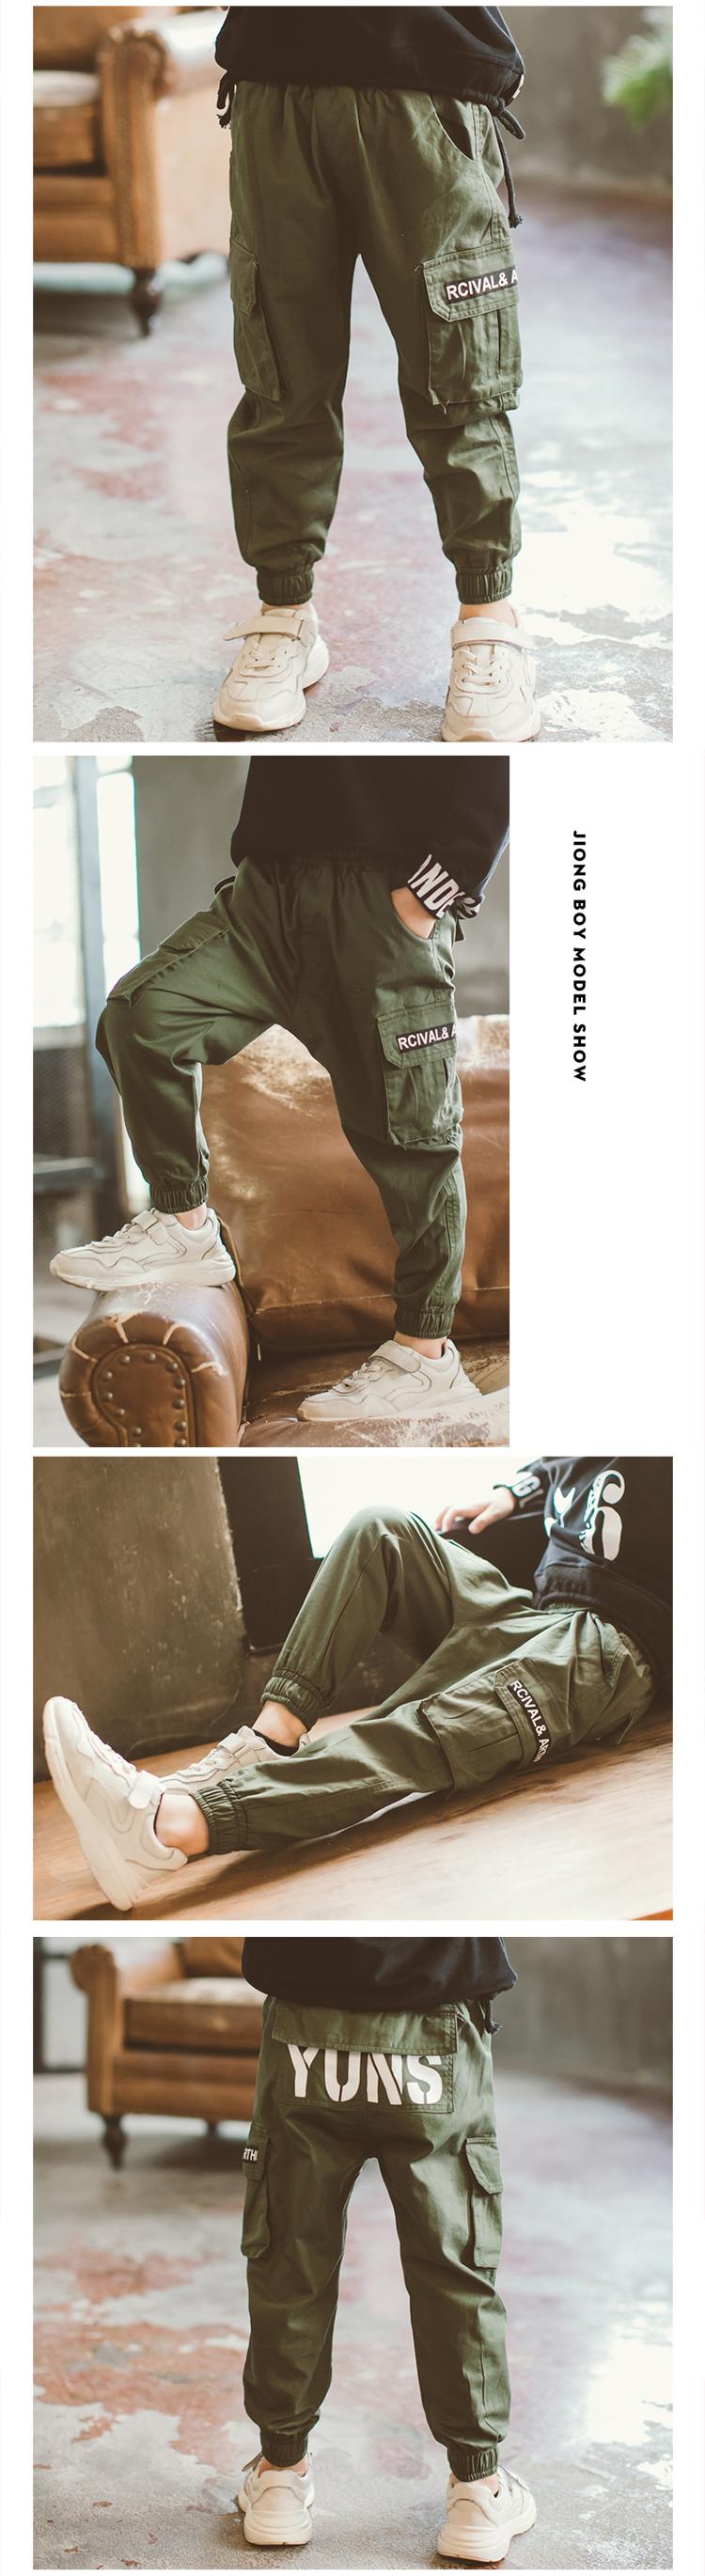 Drddjn1808b1133 Estilo Safari Pantalones De Nino De Primavera Y Otono Ninos Pantalones Largos De Diseno De Moda Los Pantalones De Los Ninos Buy Pantalones Vaqueros De Denim Product On Alibaba Com